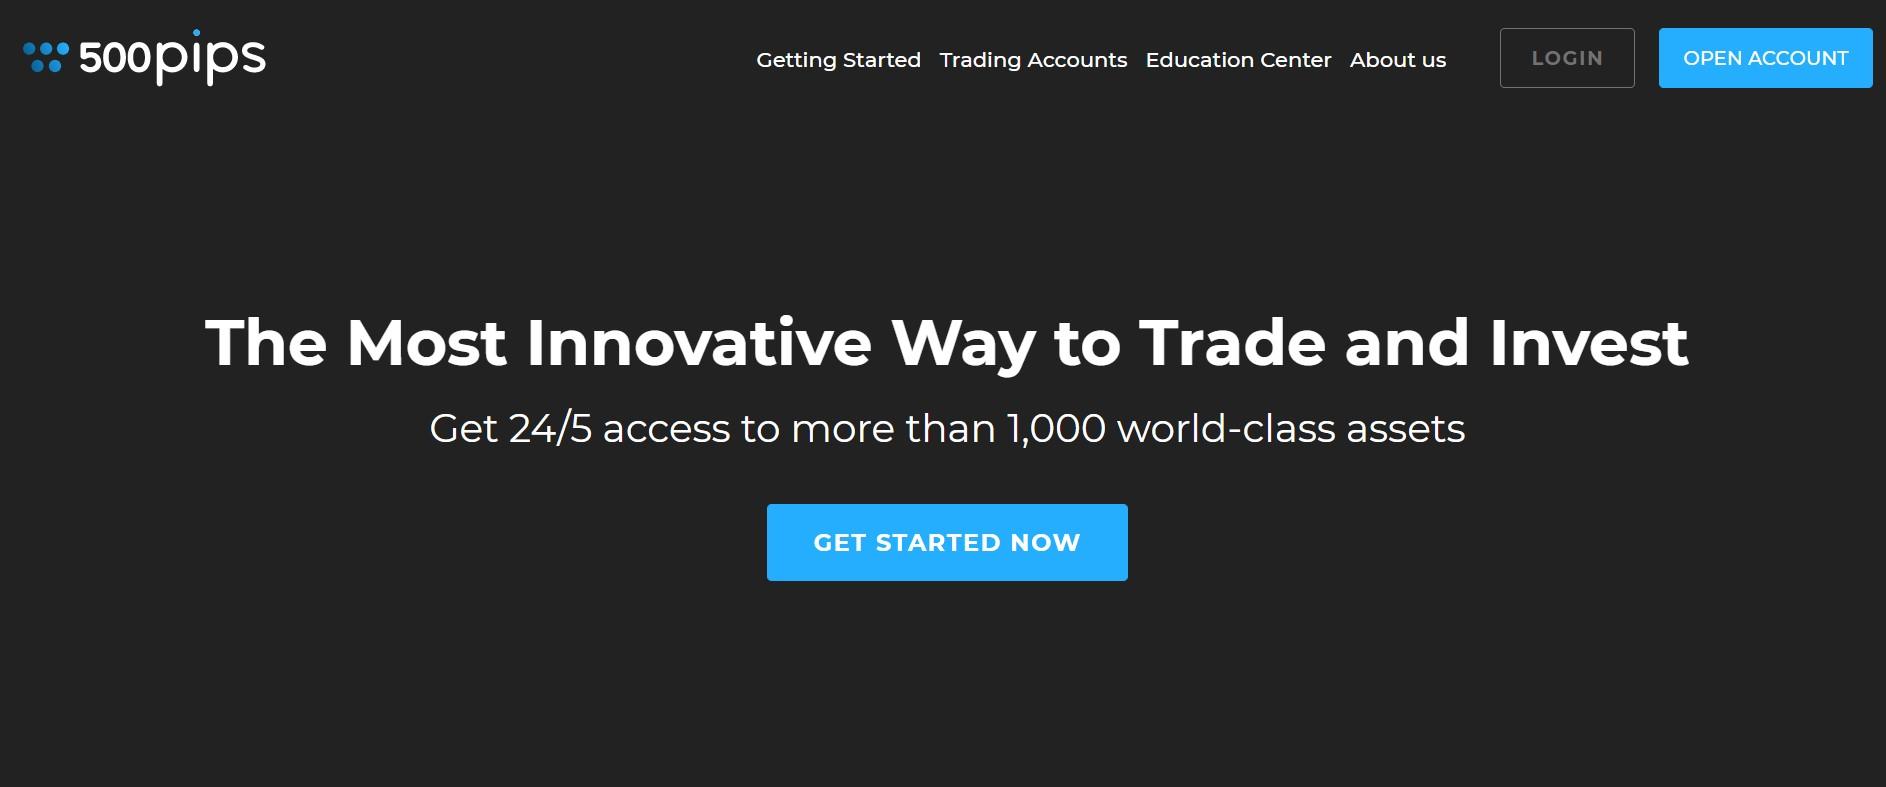 500pips website